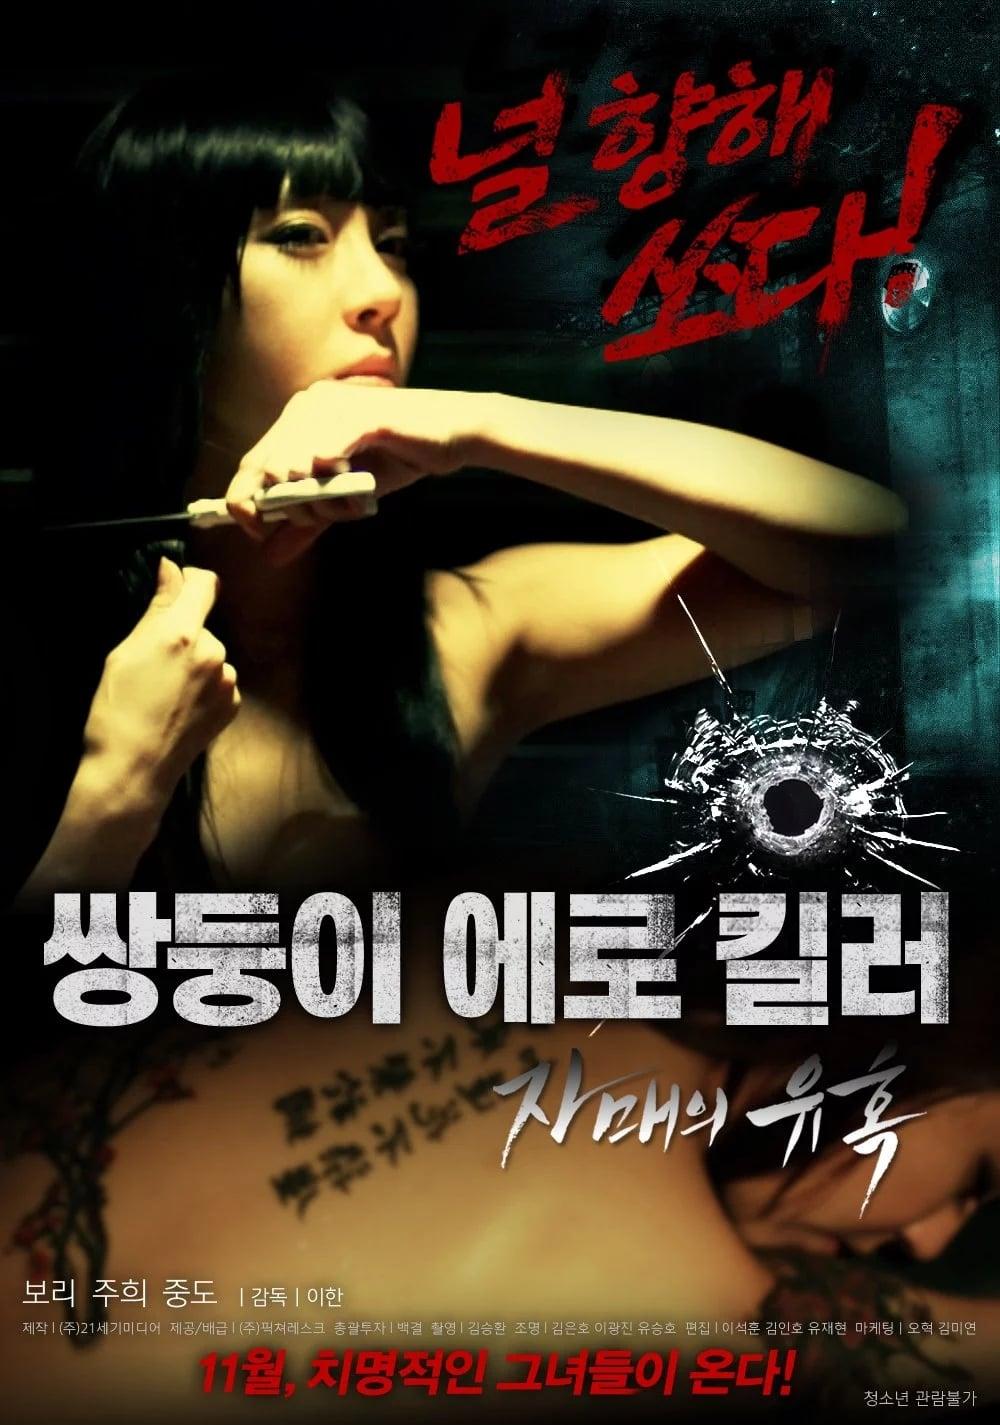 Ver ssang-doong-i elo kil-leo ? ja-mae-eui yoo-hog Online HD Español ()